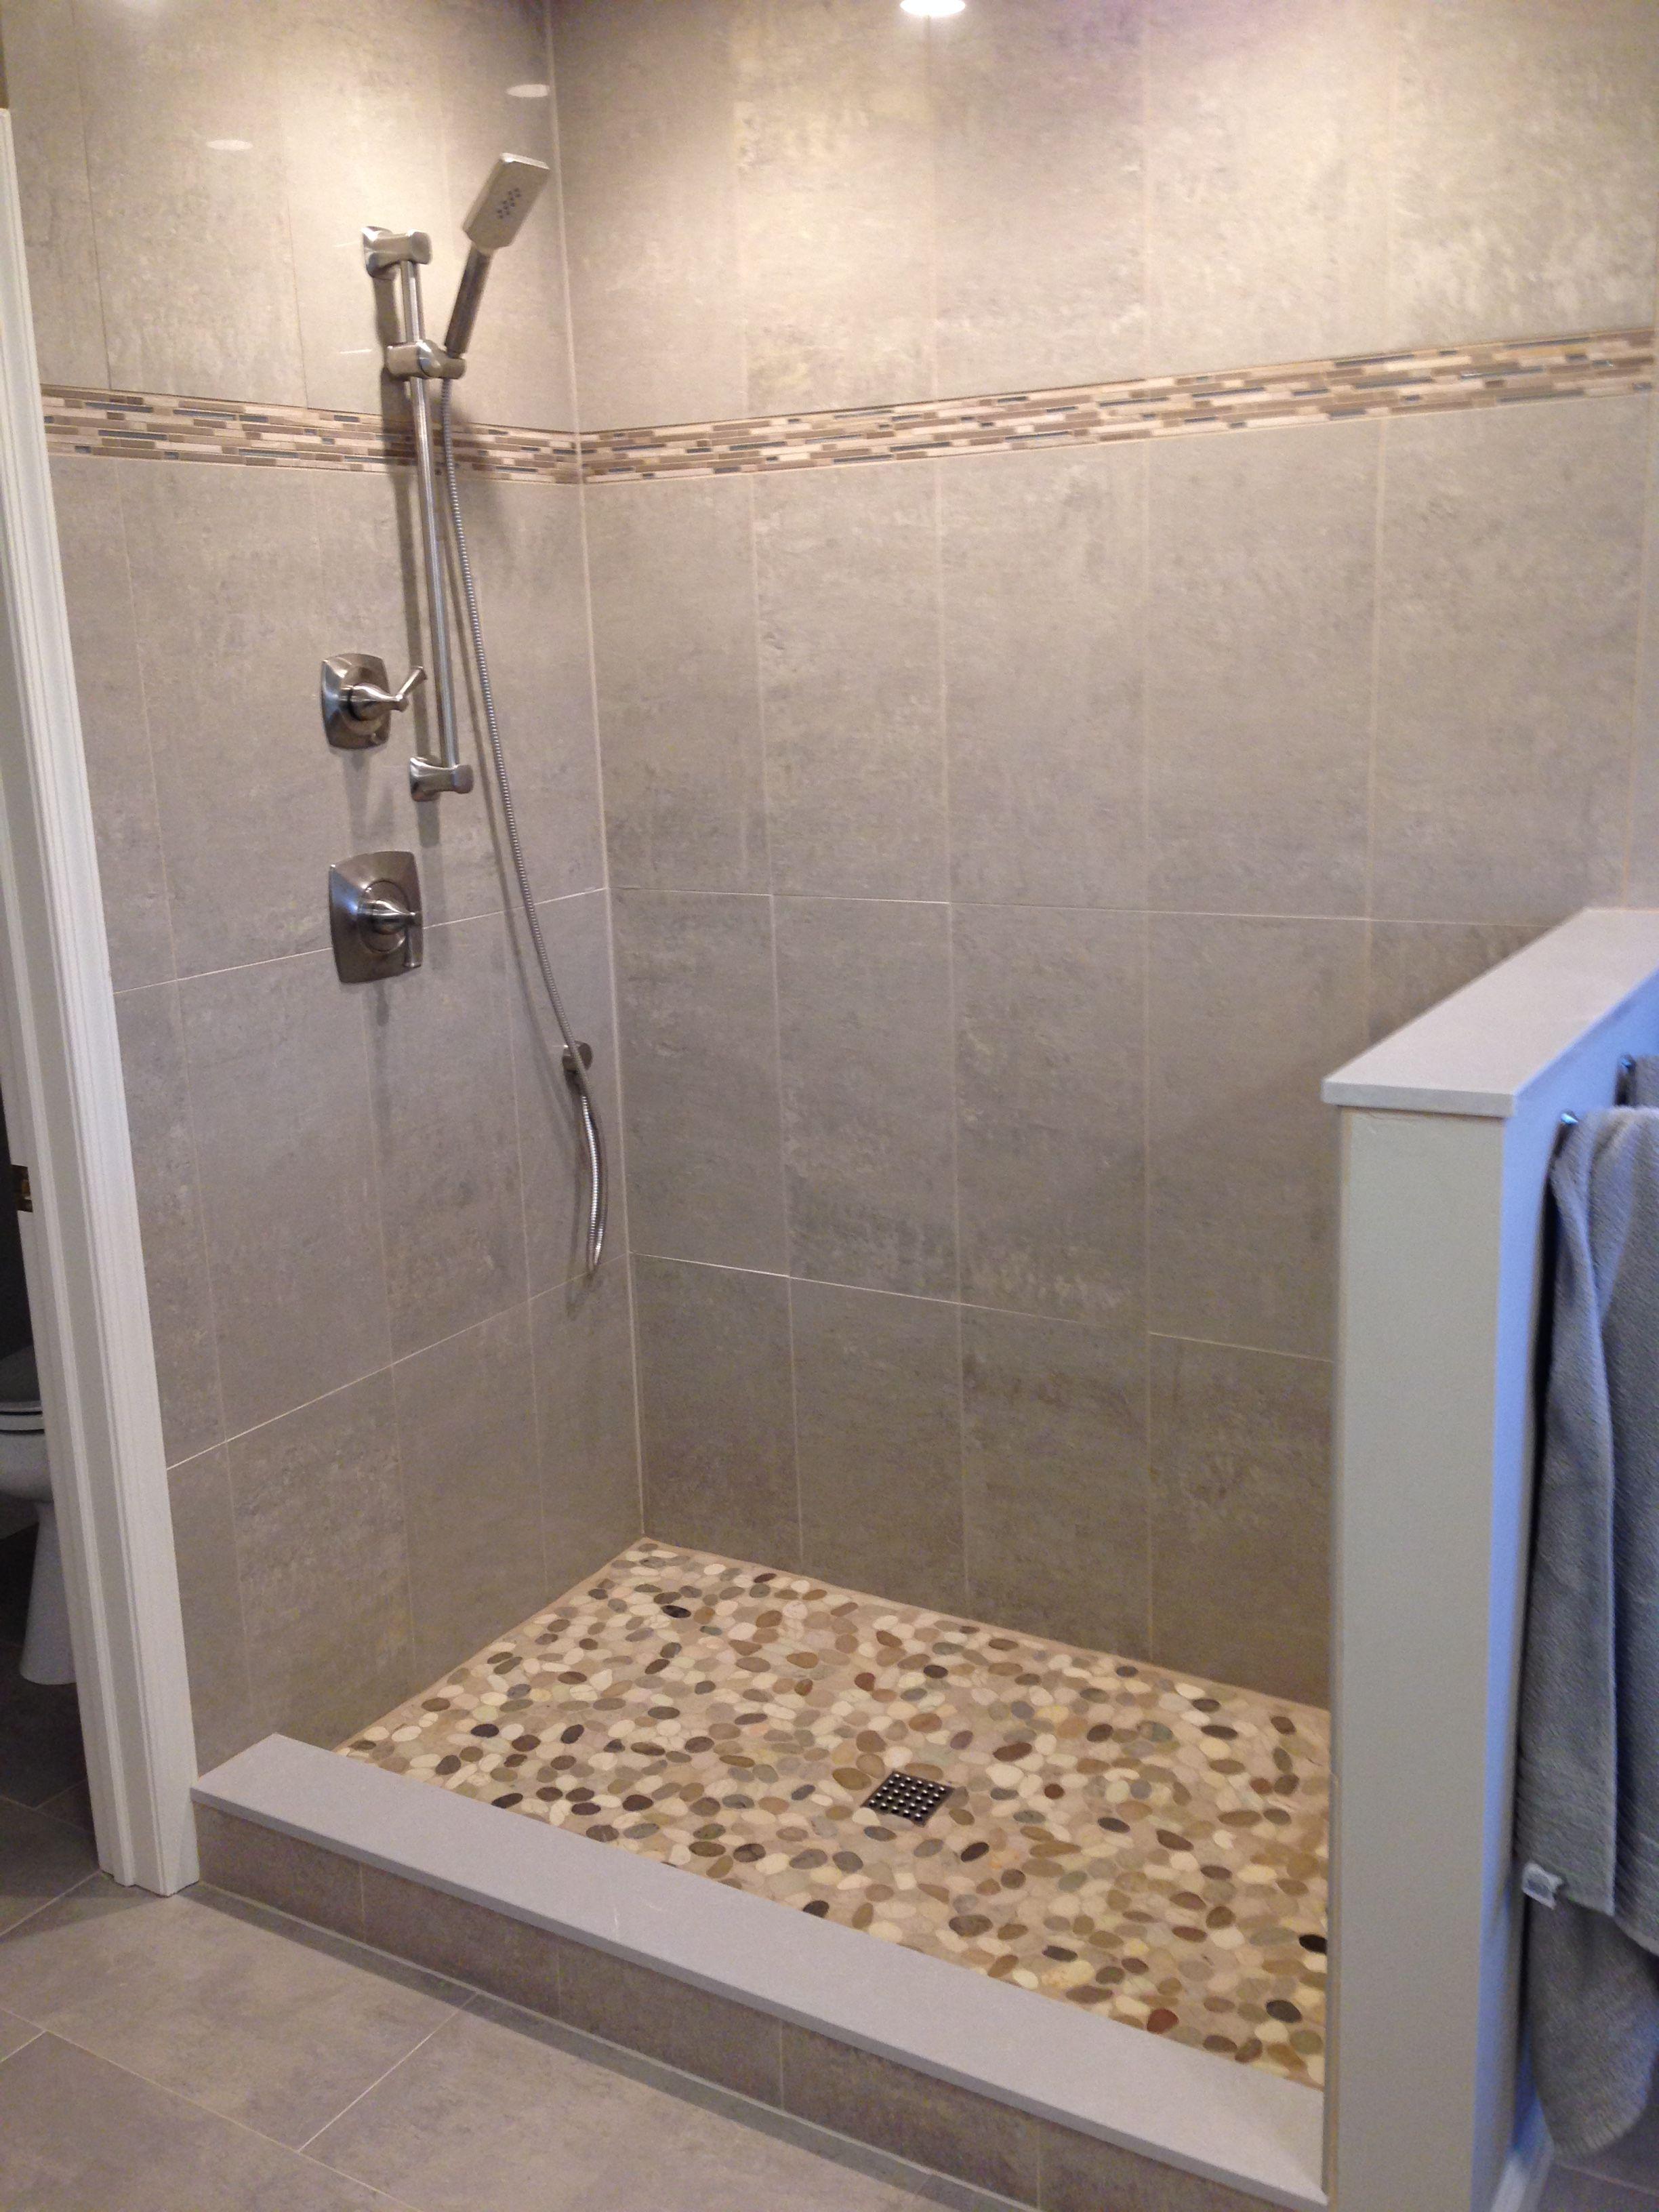 Avstile Com Nice Walk In Shower With 12 X 24 Porcelain Tile And Flat Pebble Shower Floor Pebble Shower Floor Shower Floor Shower Remodel